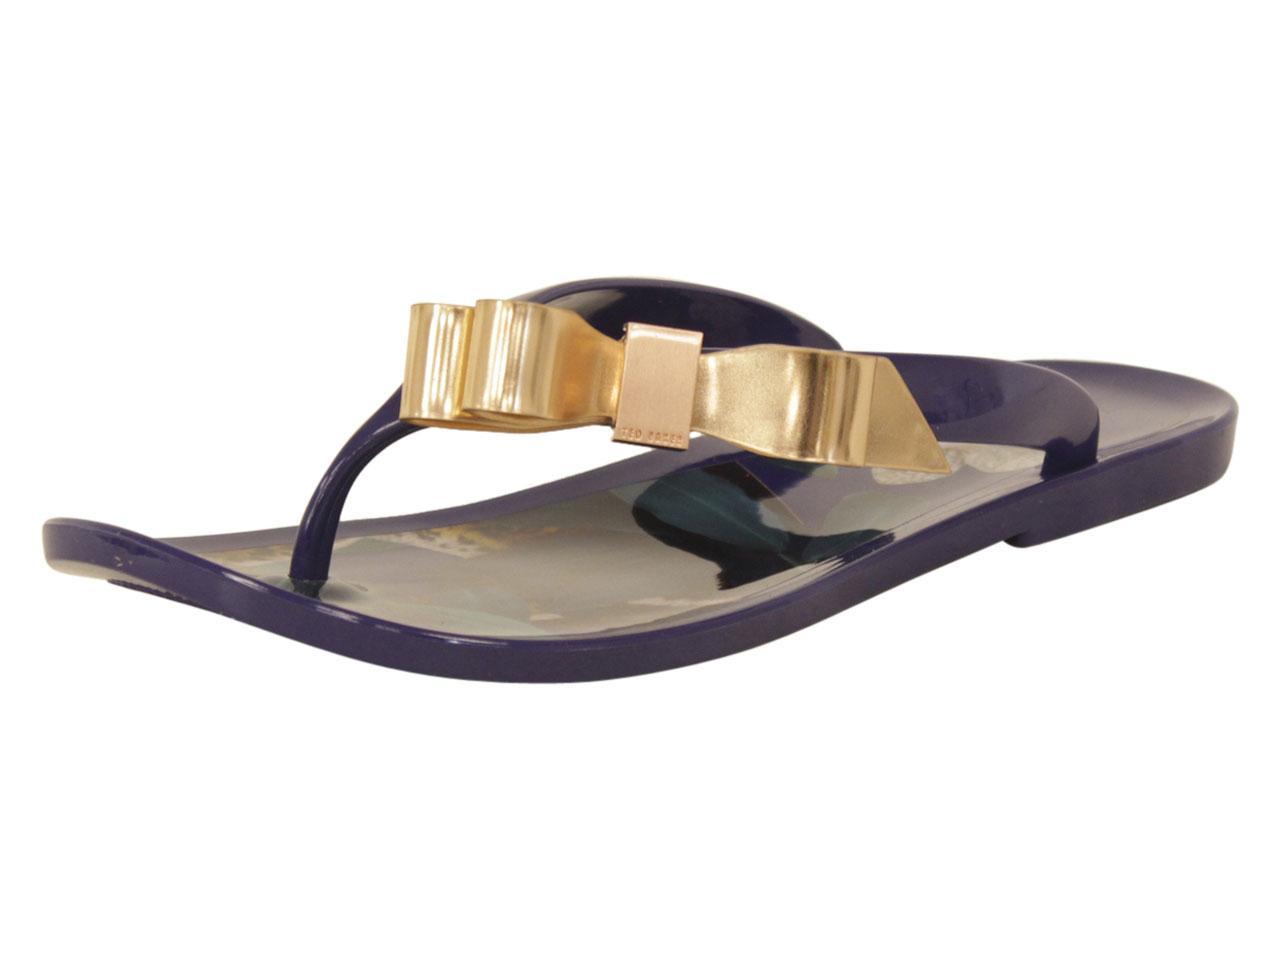 7072f3ff2 Ted Baker Women s Suzzip Flip Flops Sandals Shoes